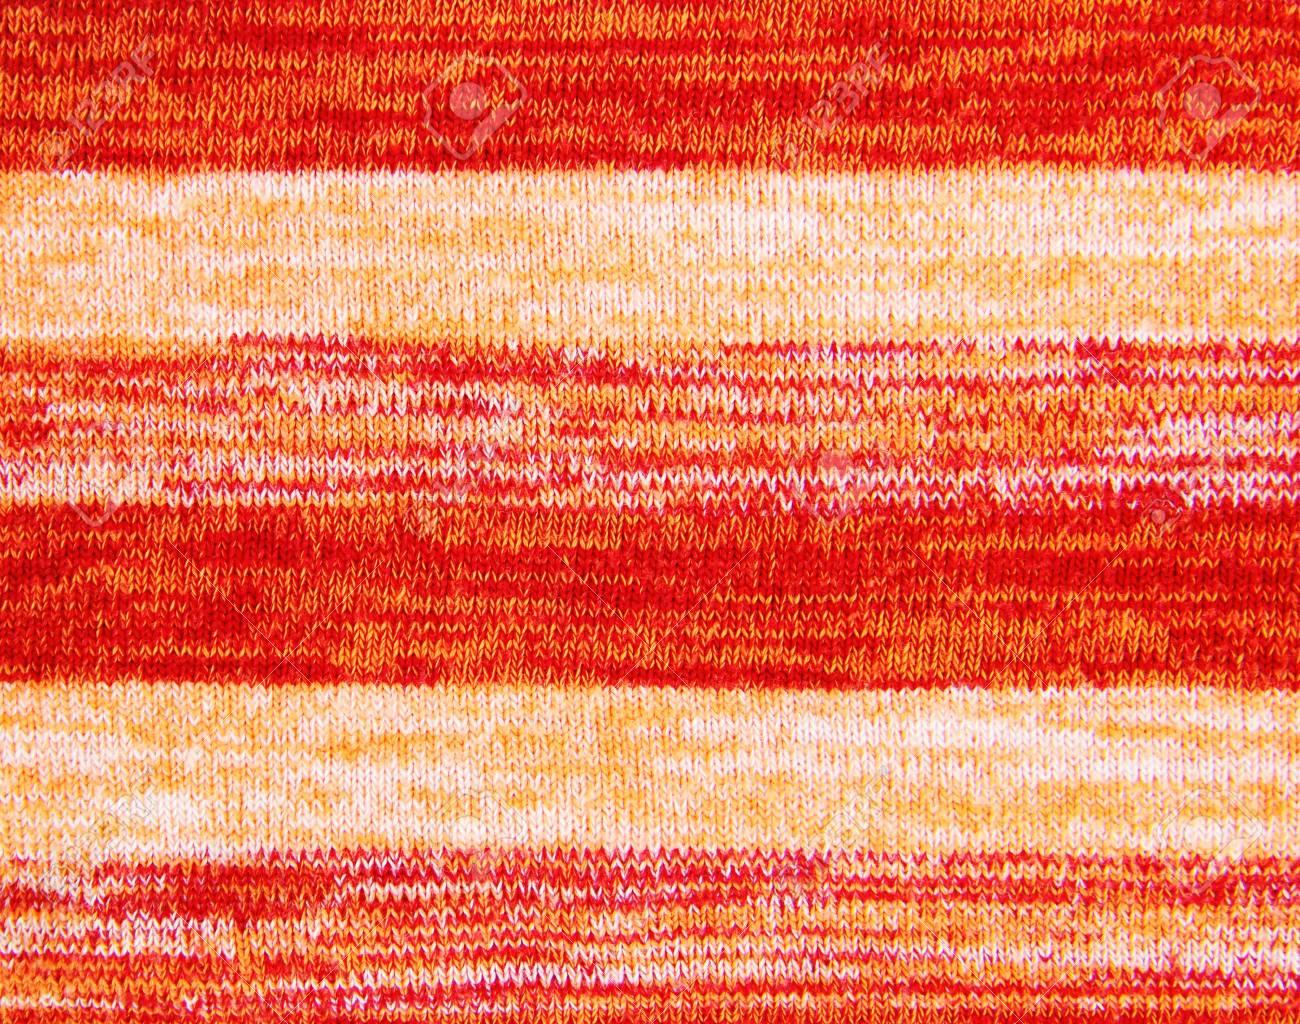 Orange knitted fabric Stock Photo - 17453810